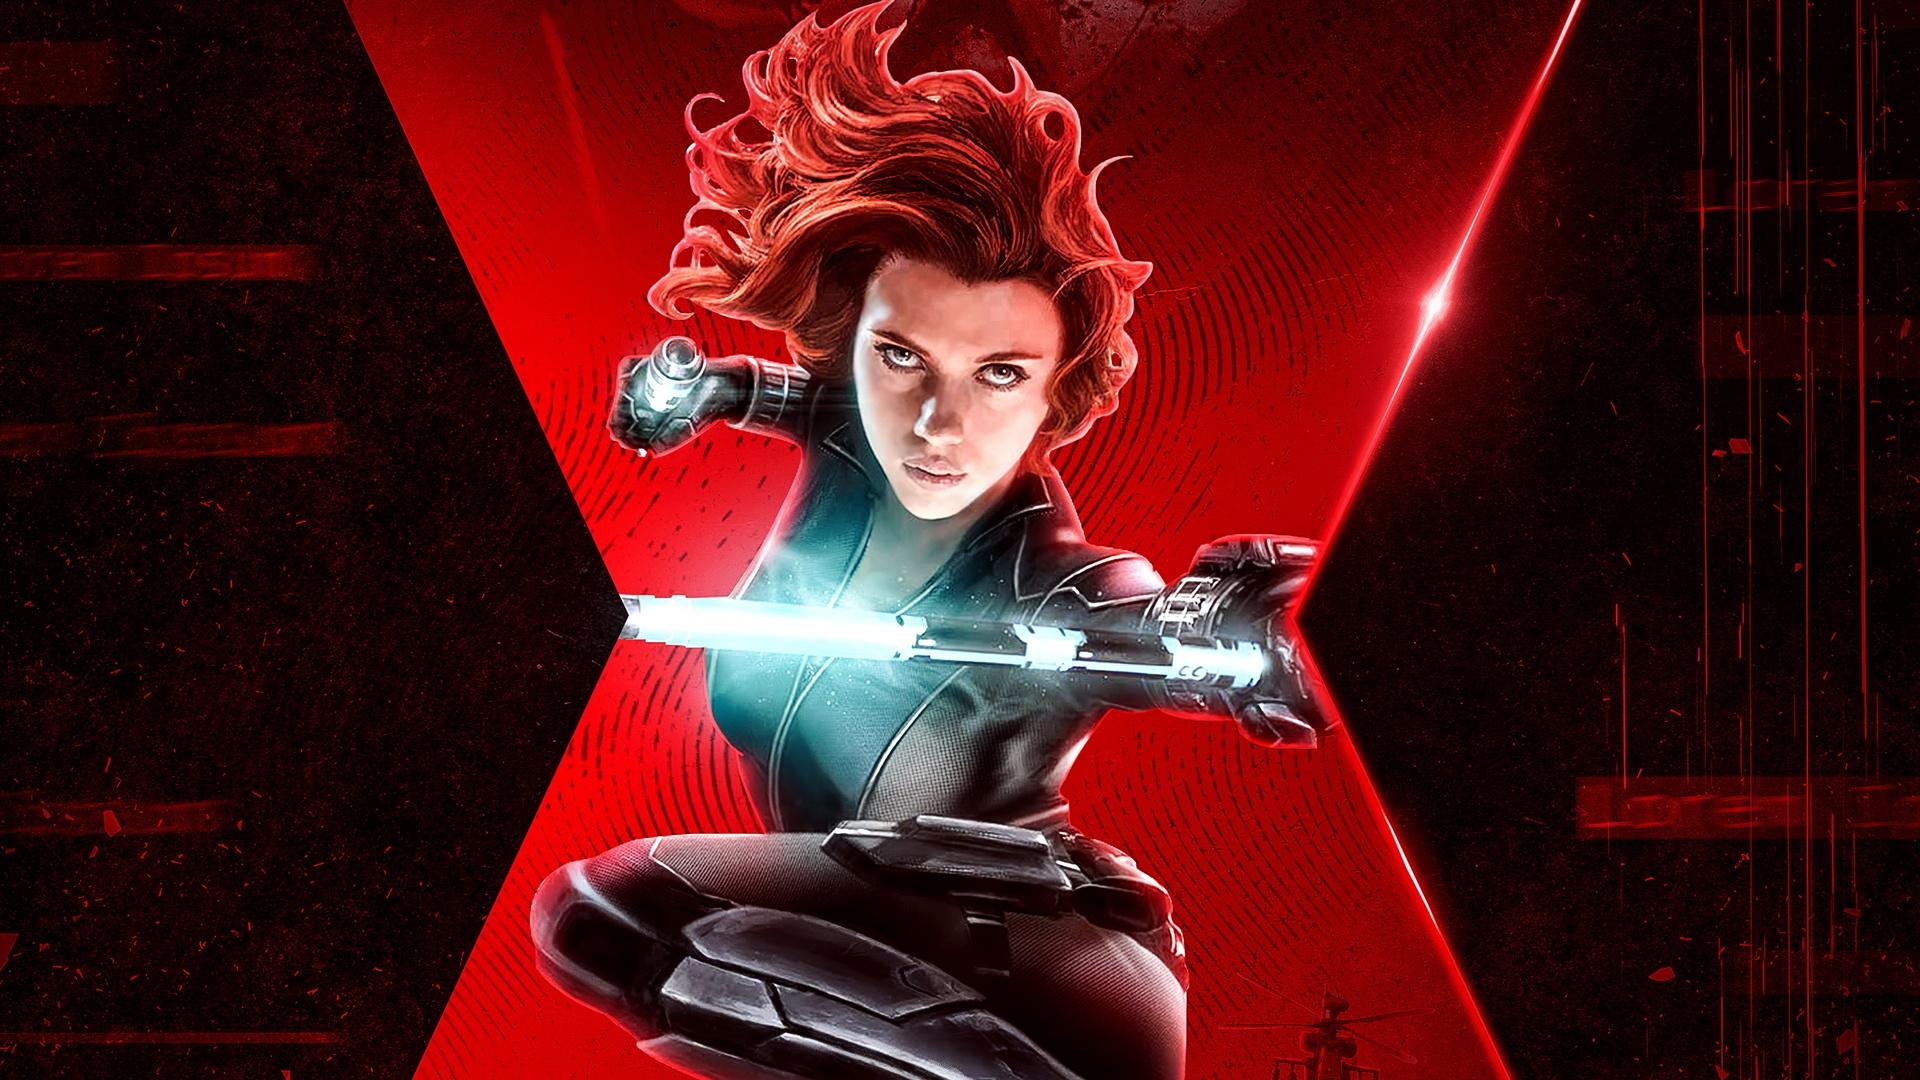 Black Widow best wallpaper